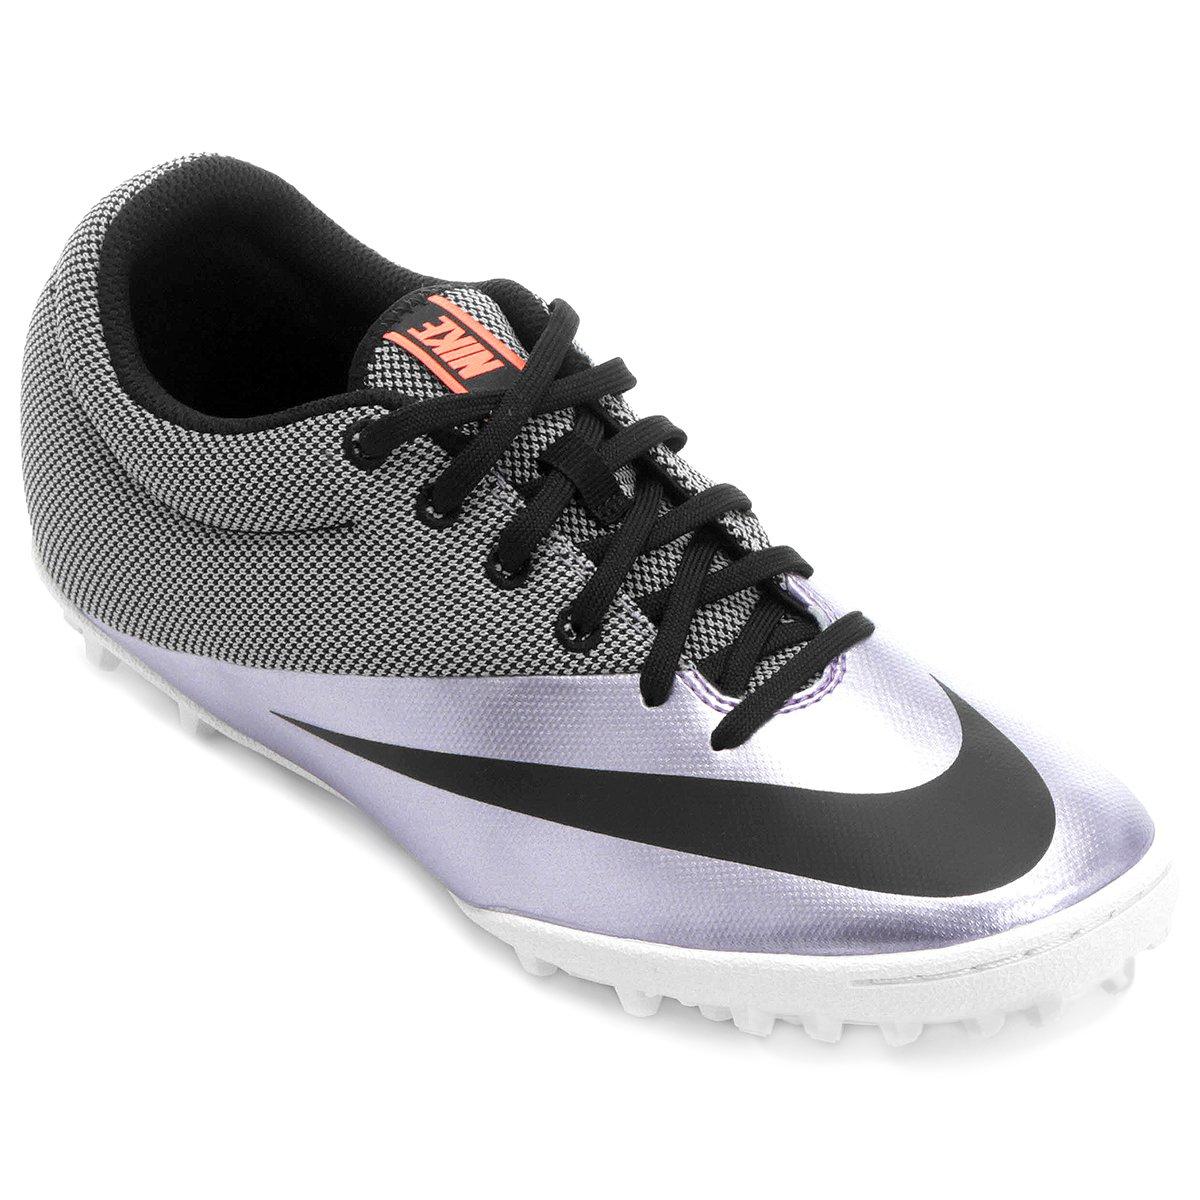 6f431f2b5e Chuteira Nike Mercurial Pro TF Society - Compre Agora